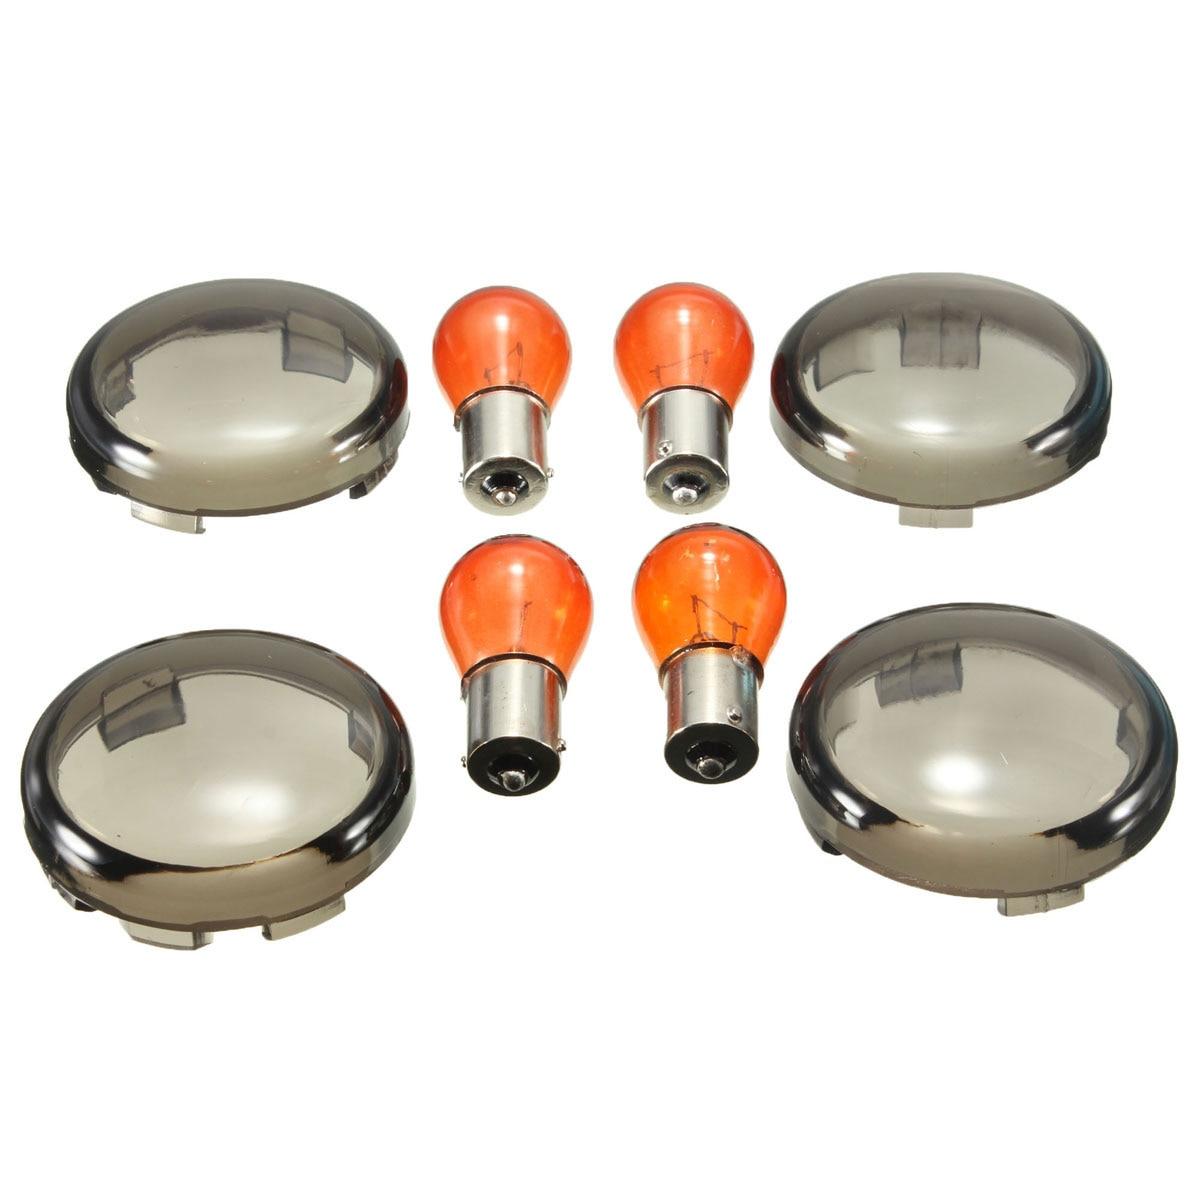 ᗜ lj 4 Pcs Ensemble Pour Harley Davidson Clignotant Ambre Ampoule Sportster Softail Dyna Lighting Comm U59